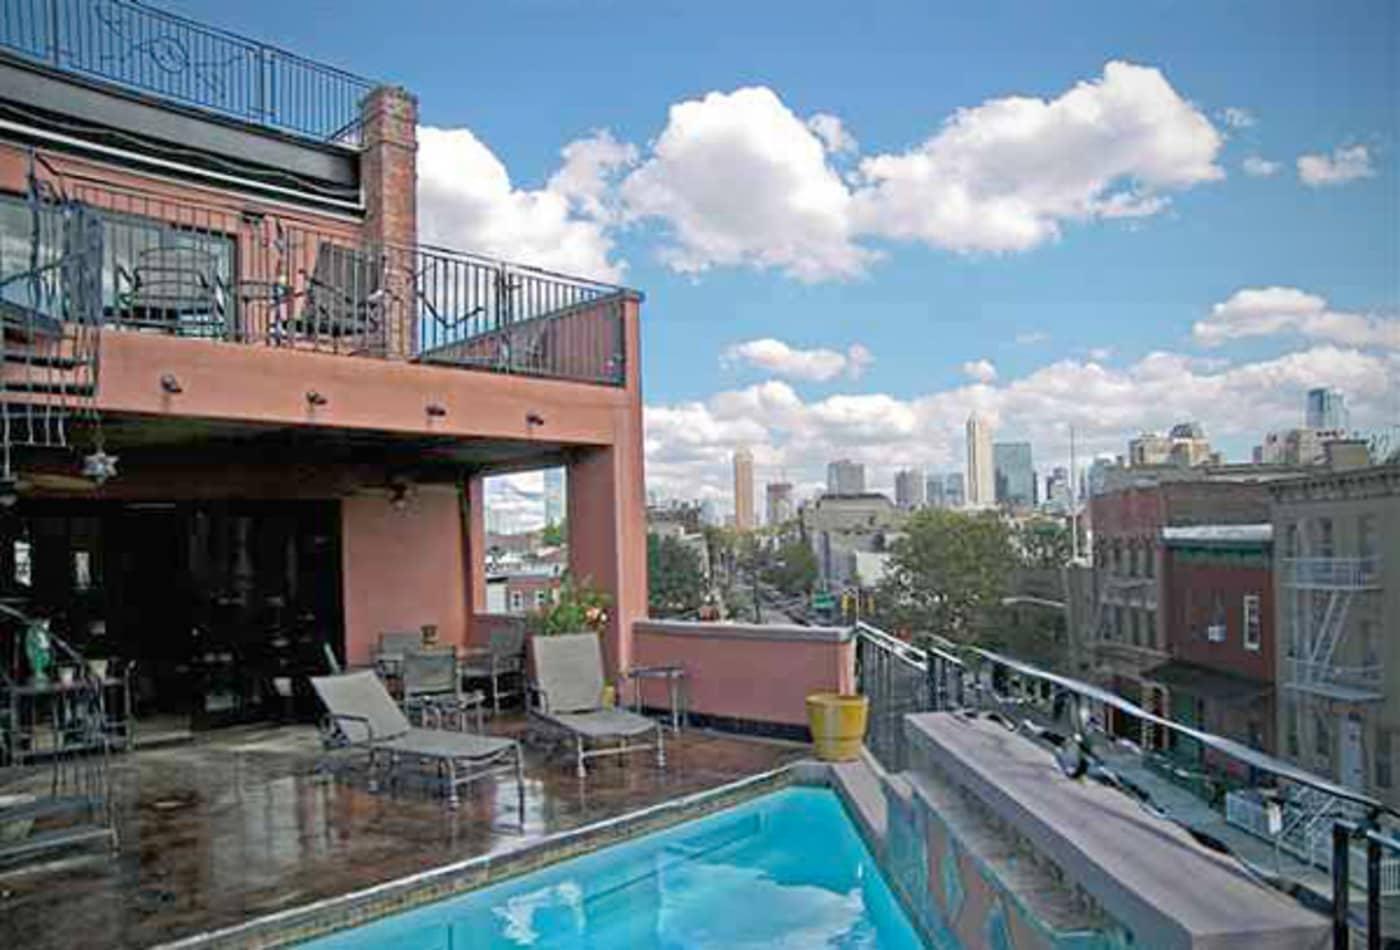 CNBC_extreme_rooftops_jerseycity.jpg